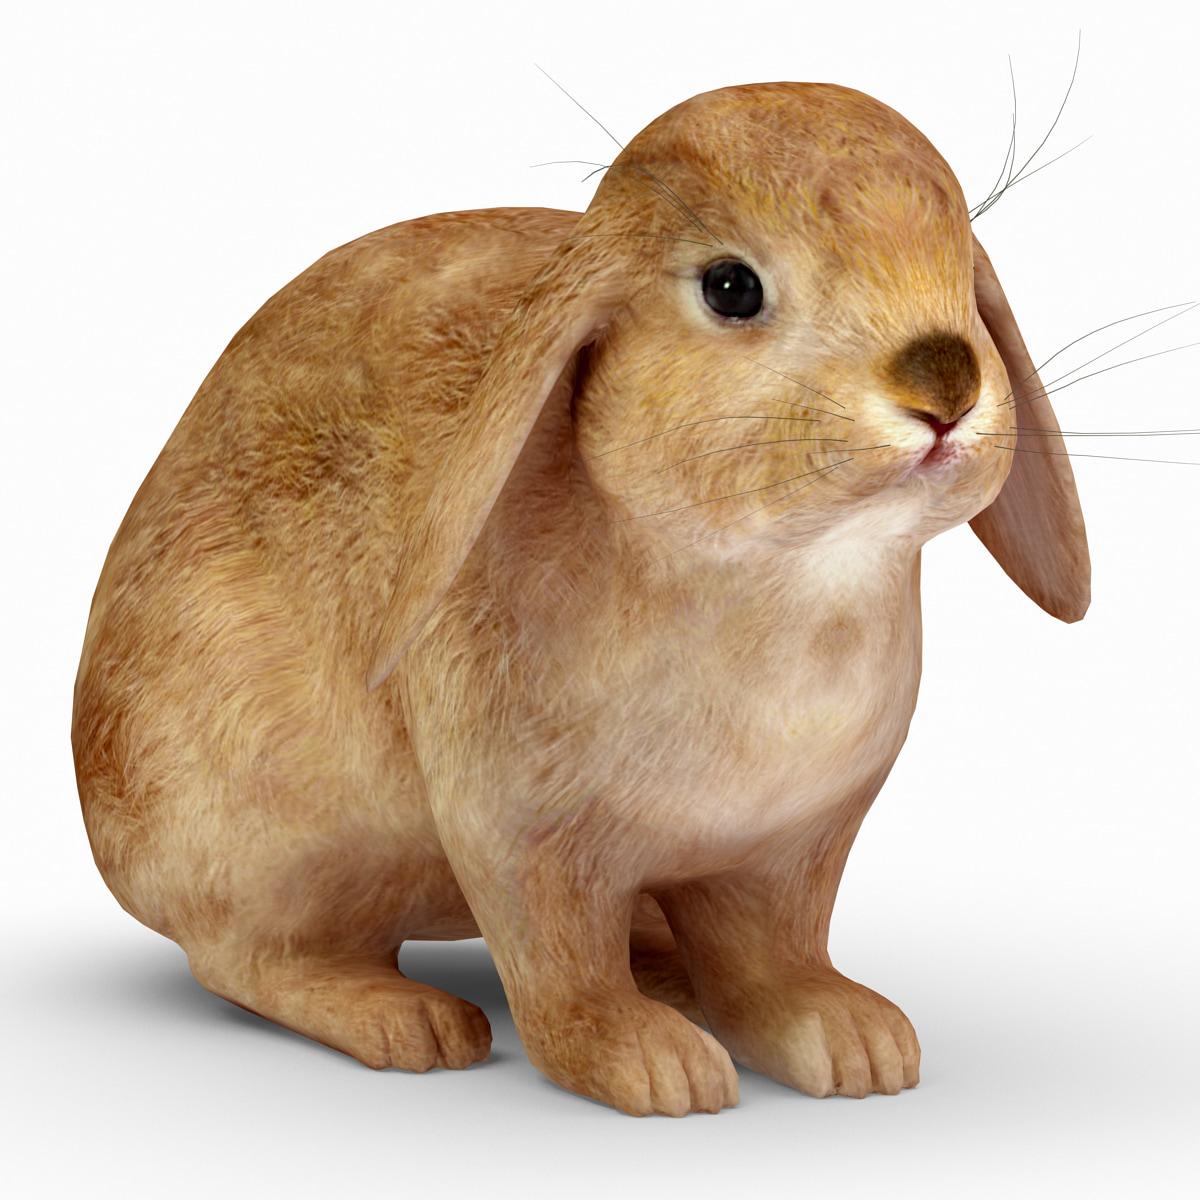 rabbit_red_001.jpg